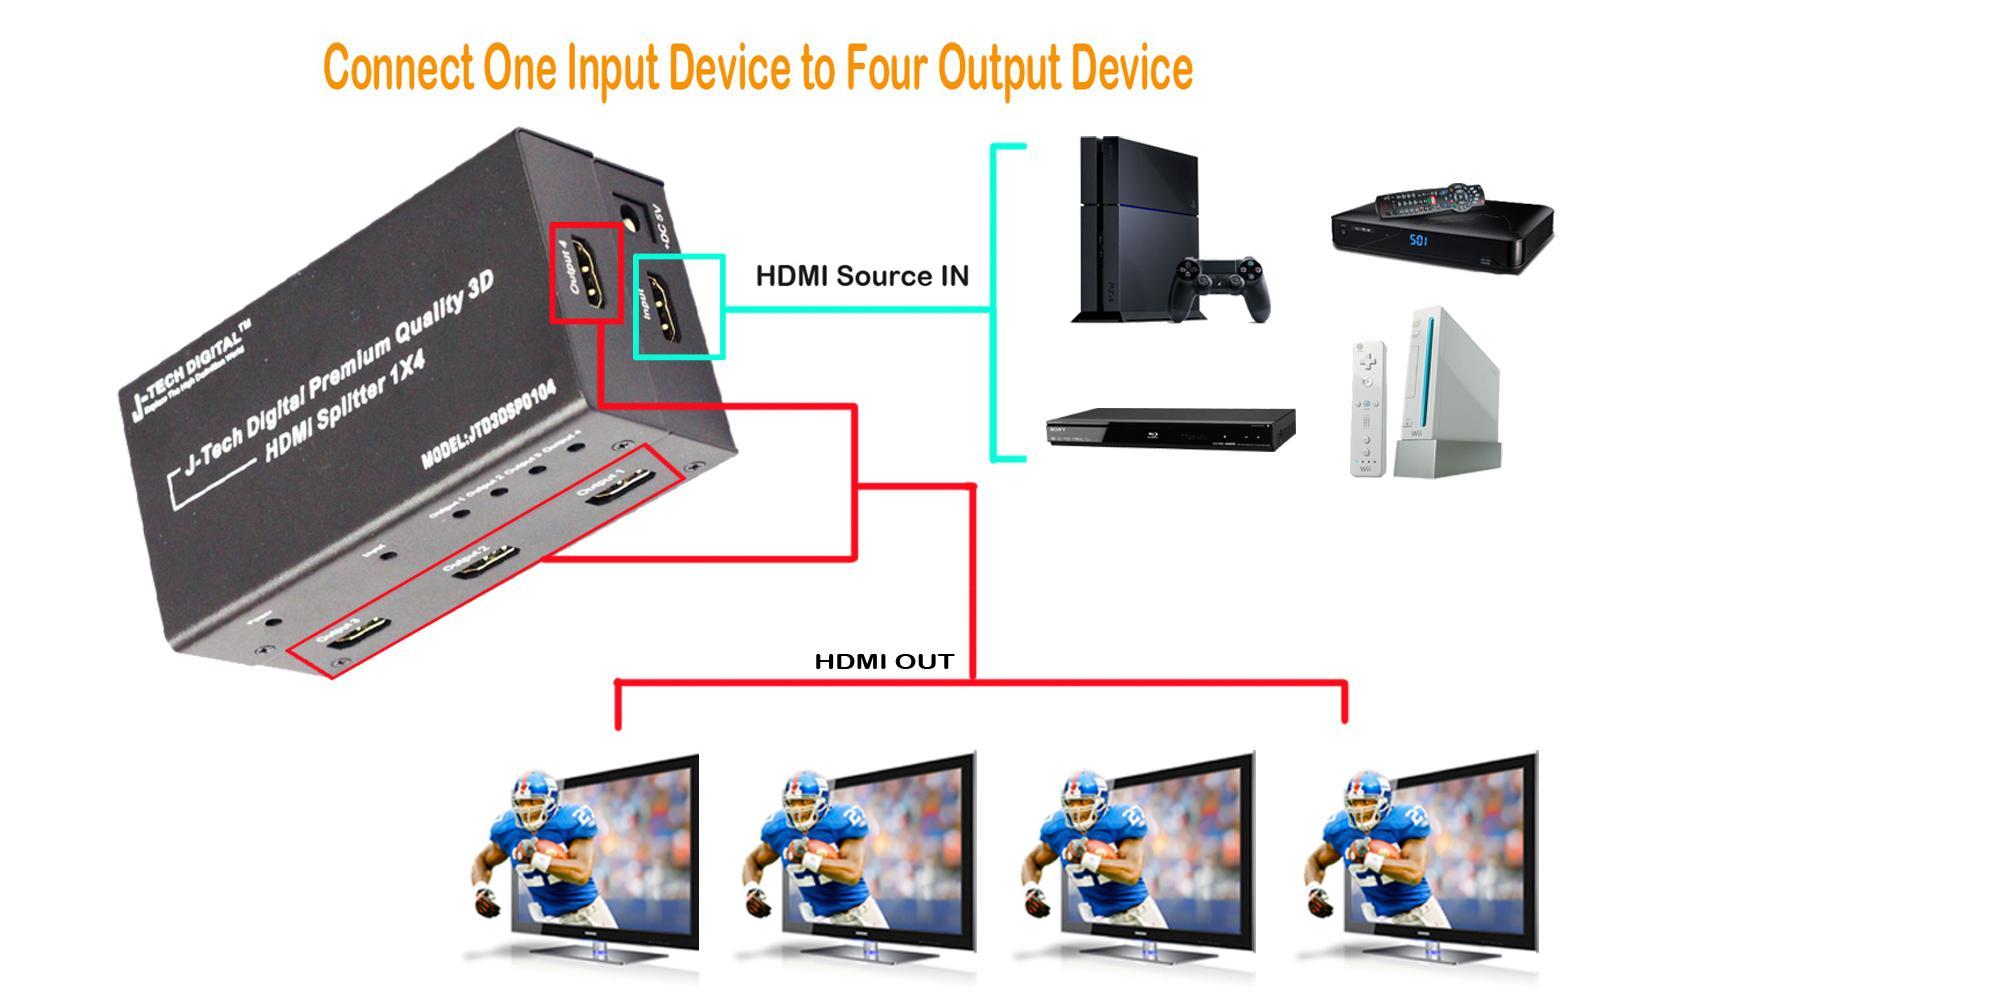 Amazon.com: J-Tech Digital TM 4 Ports HDMI 1x4 Powered Splitter Ver 1.3 Certified for Full HD